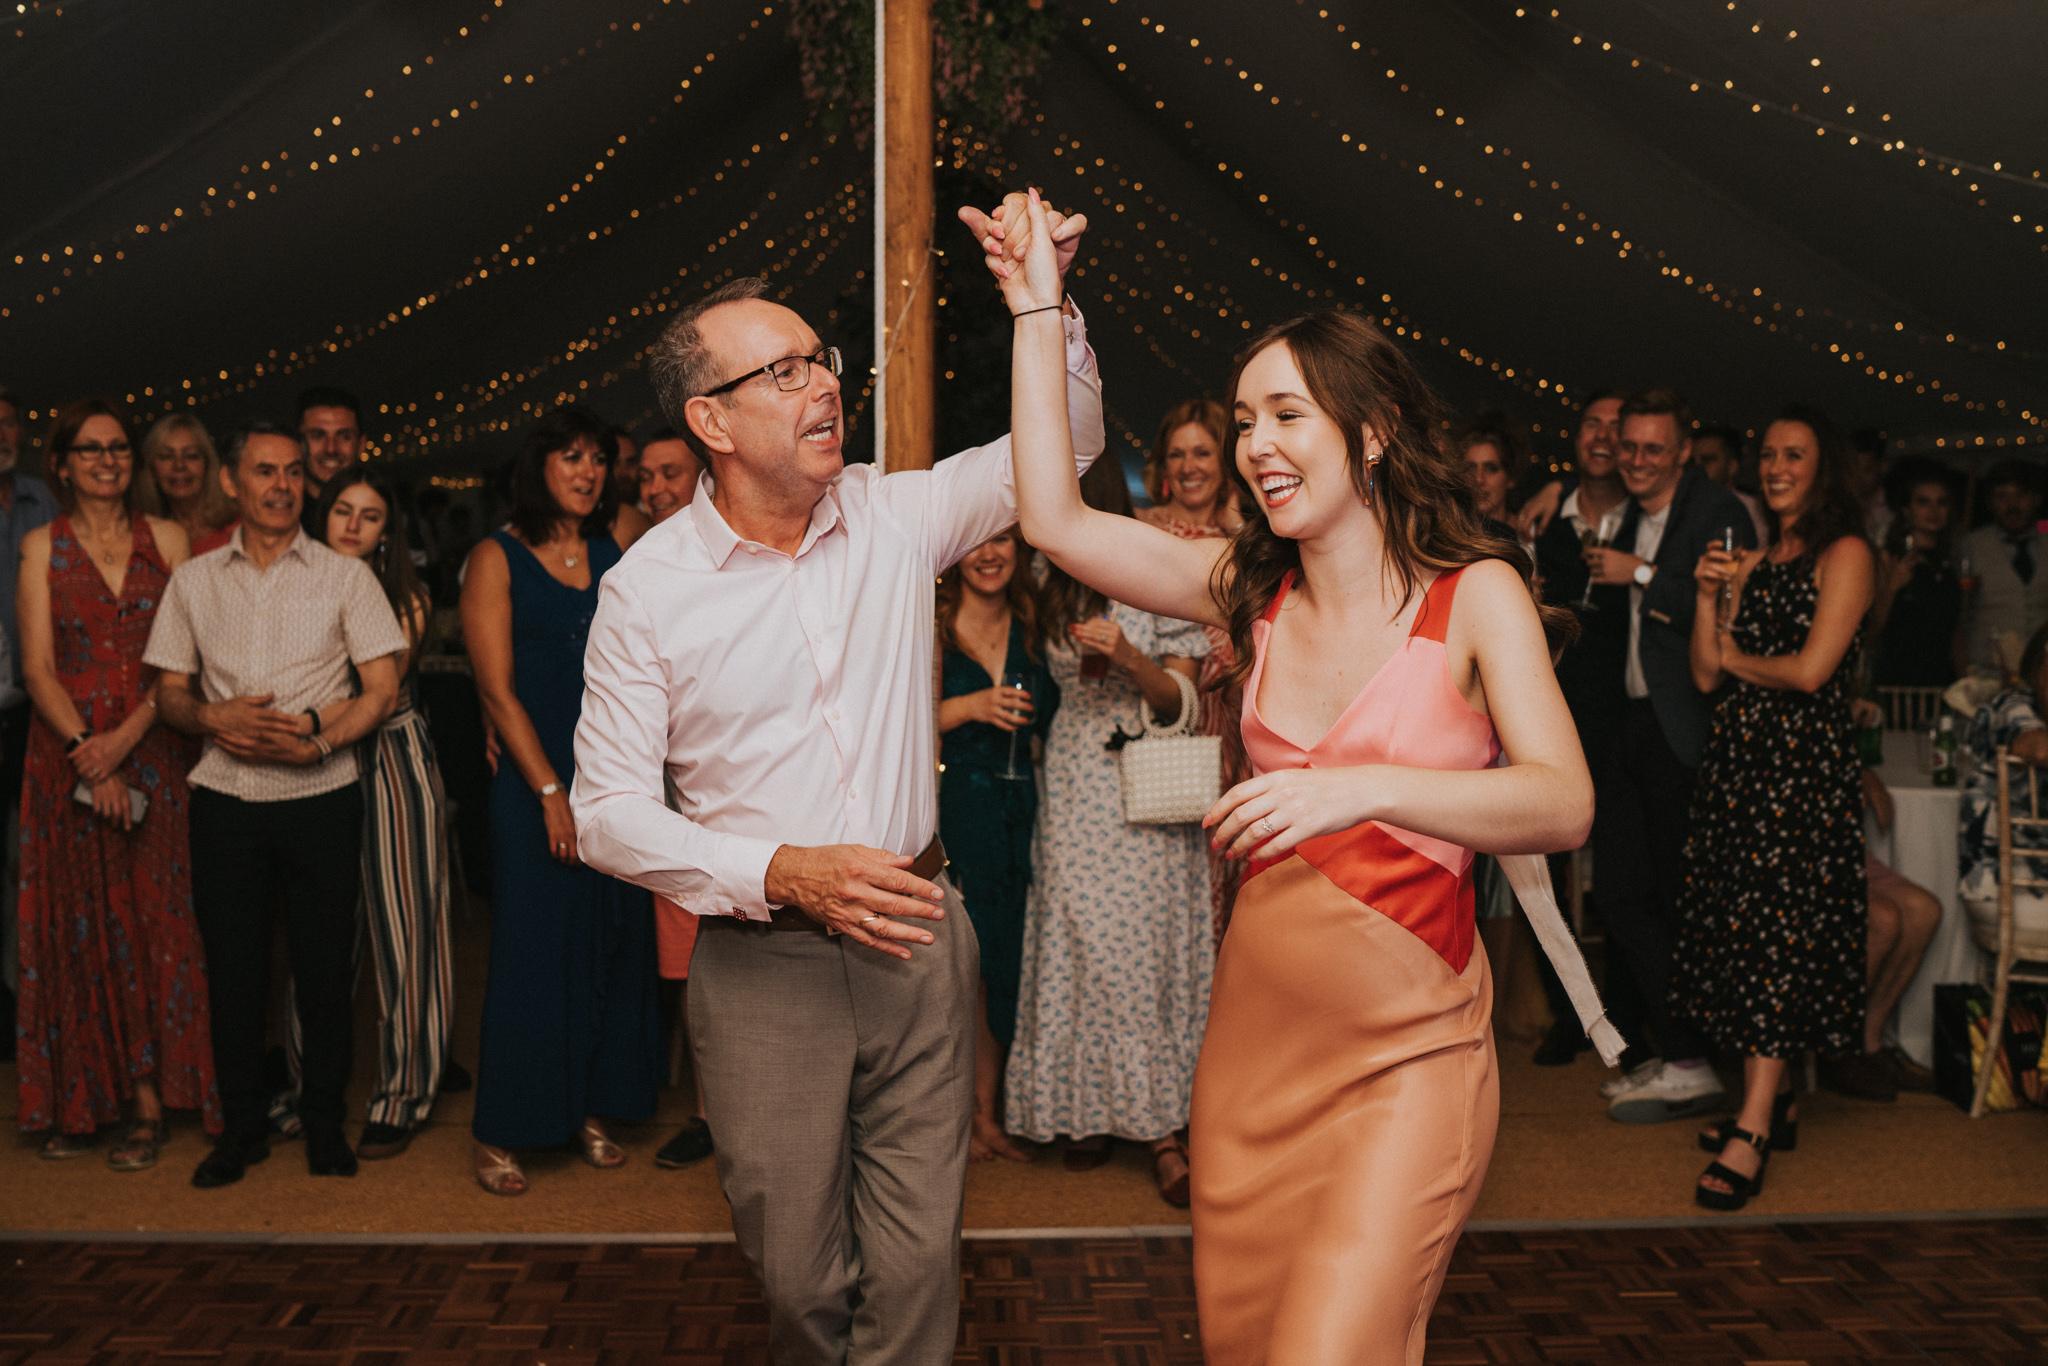 emi-Jack-boho-diy-wedding-eggington-house-grace-elizabeth-colchester-essex-alternative-wedding-photographer-suffolk-norfolk-devon (55 of 56).jpg